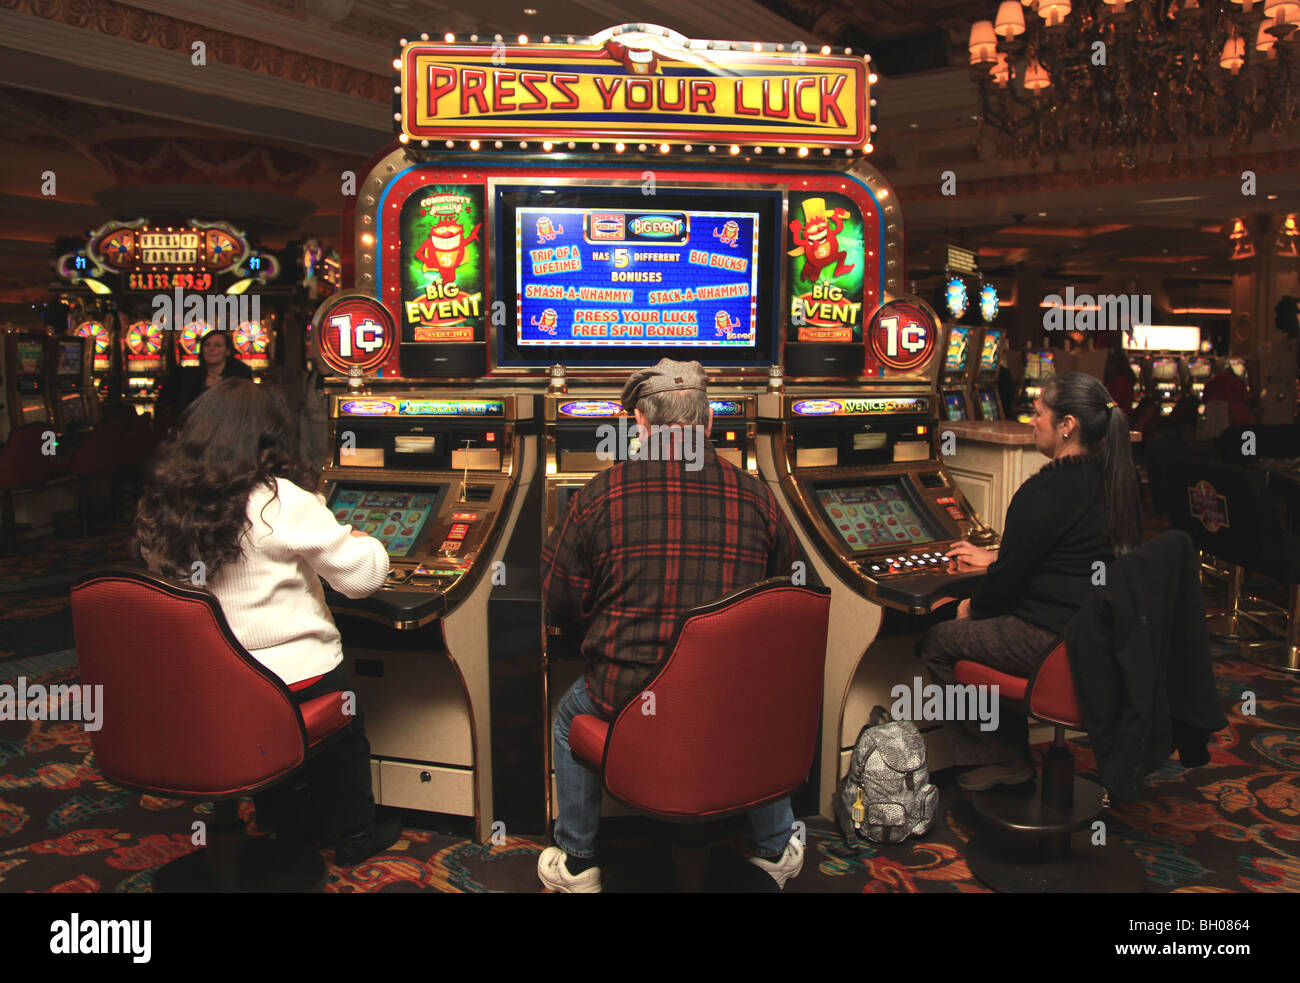 Safest casino games online usa players